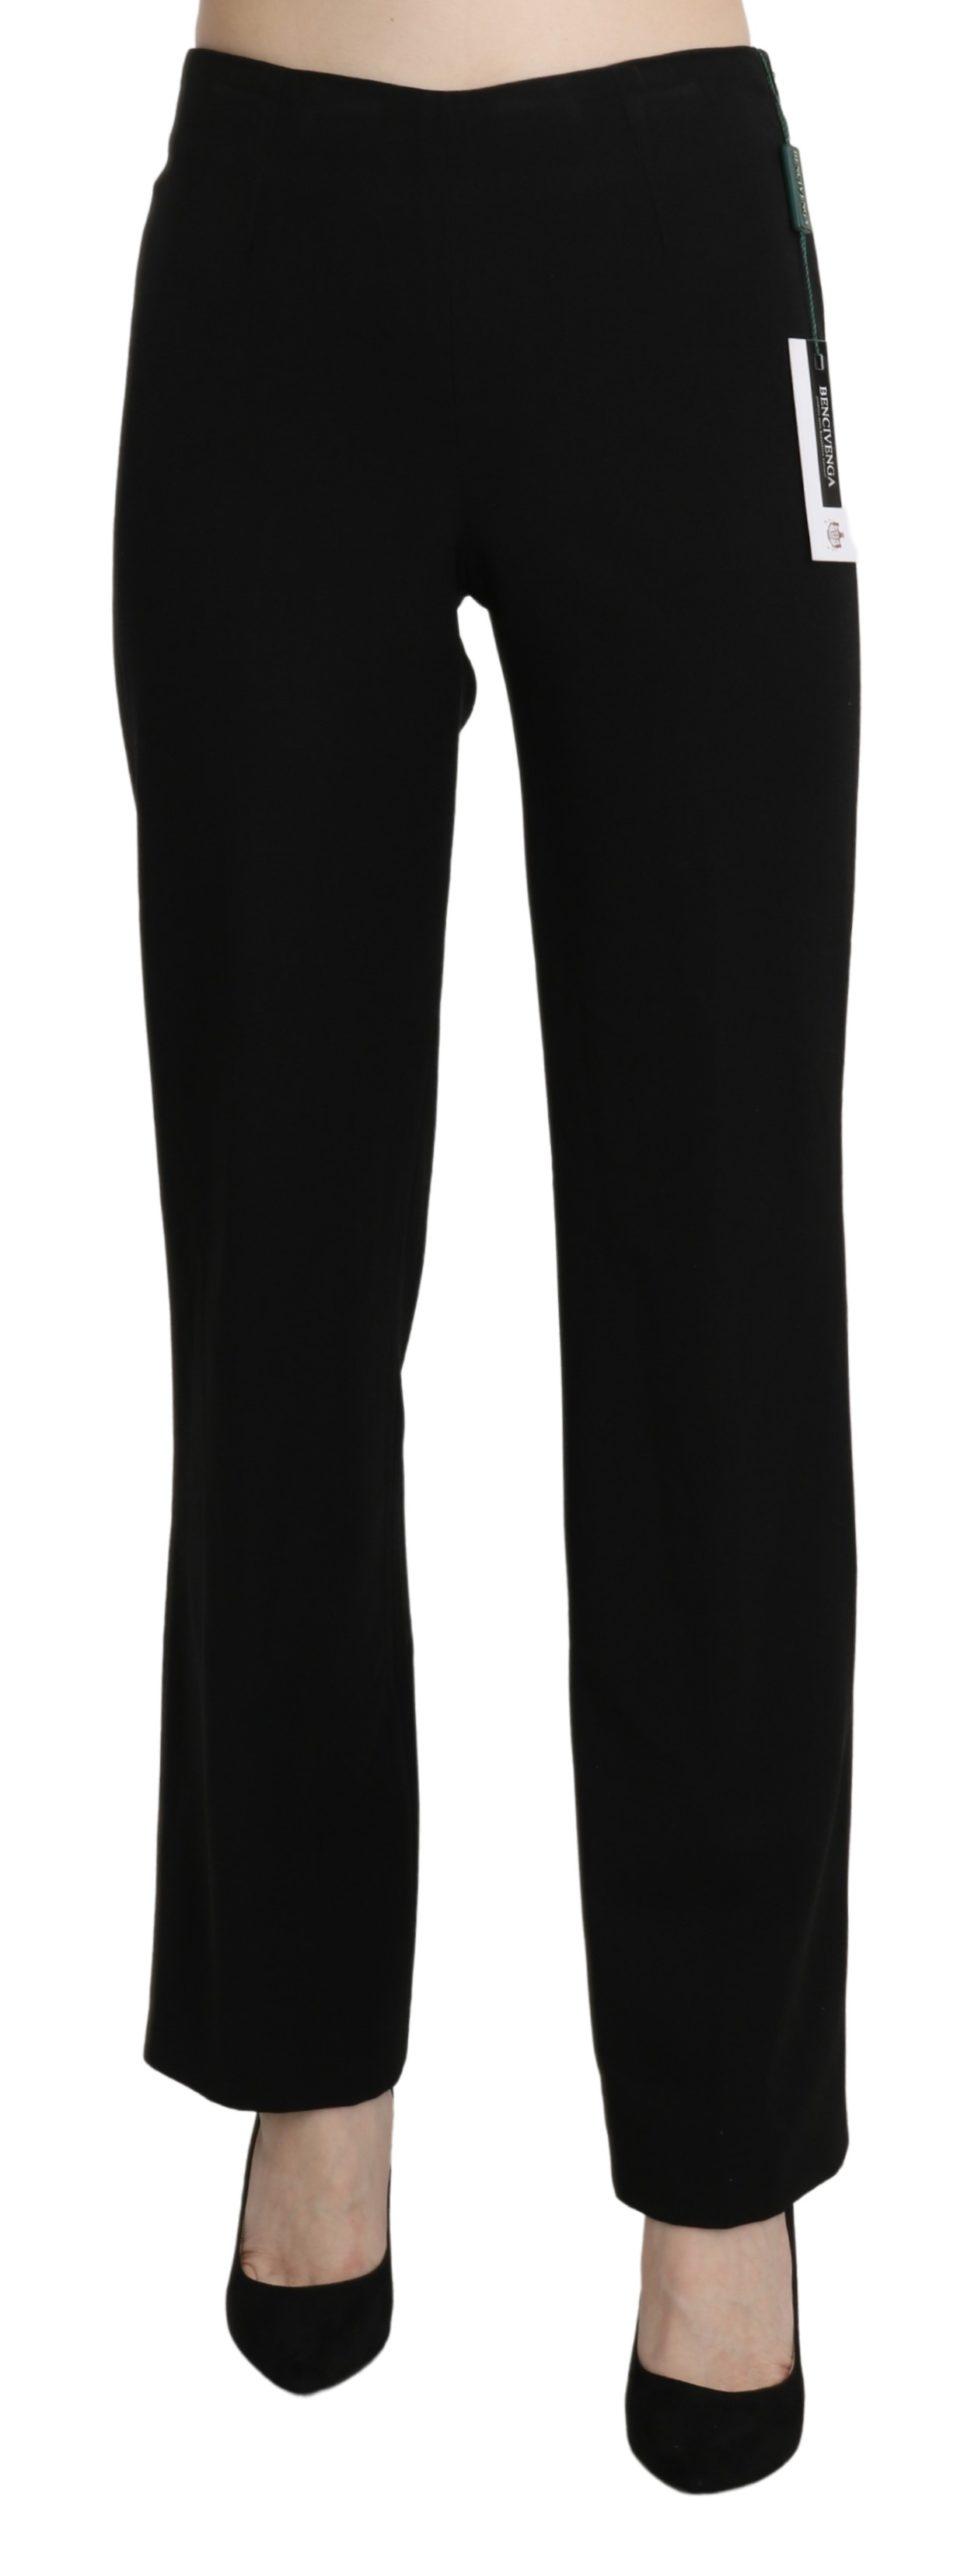 BENCIVENGA Women's High Waist Straight Formal Trouser Black PAN71325-44 - IT44|L